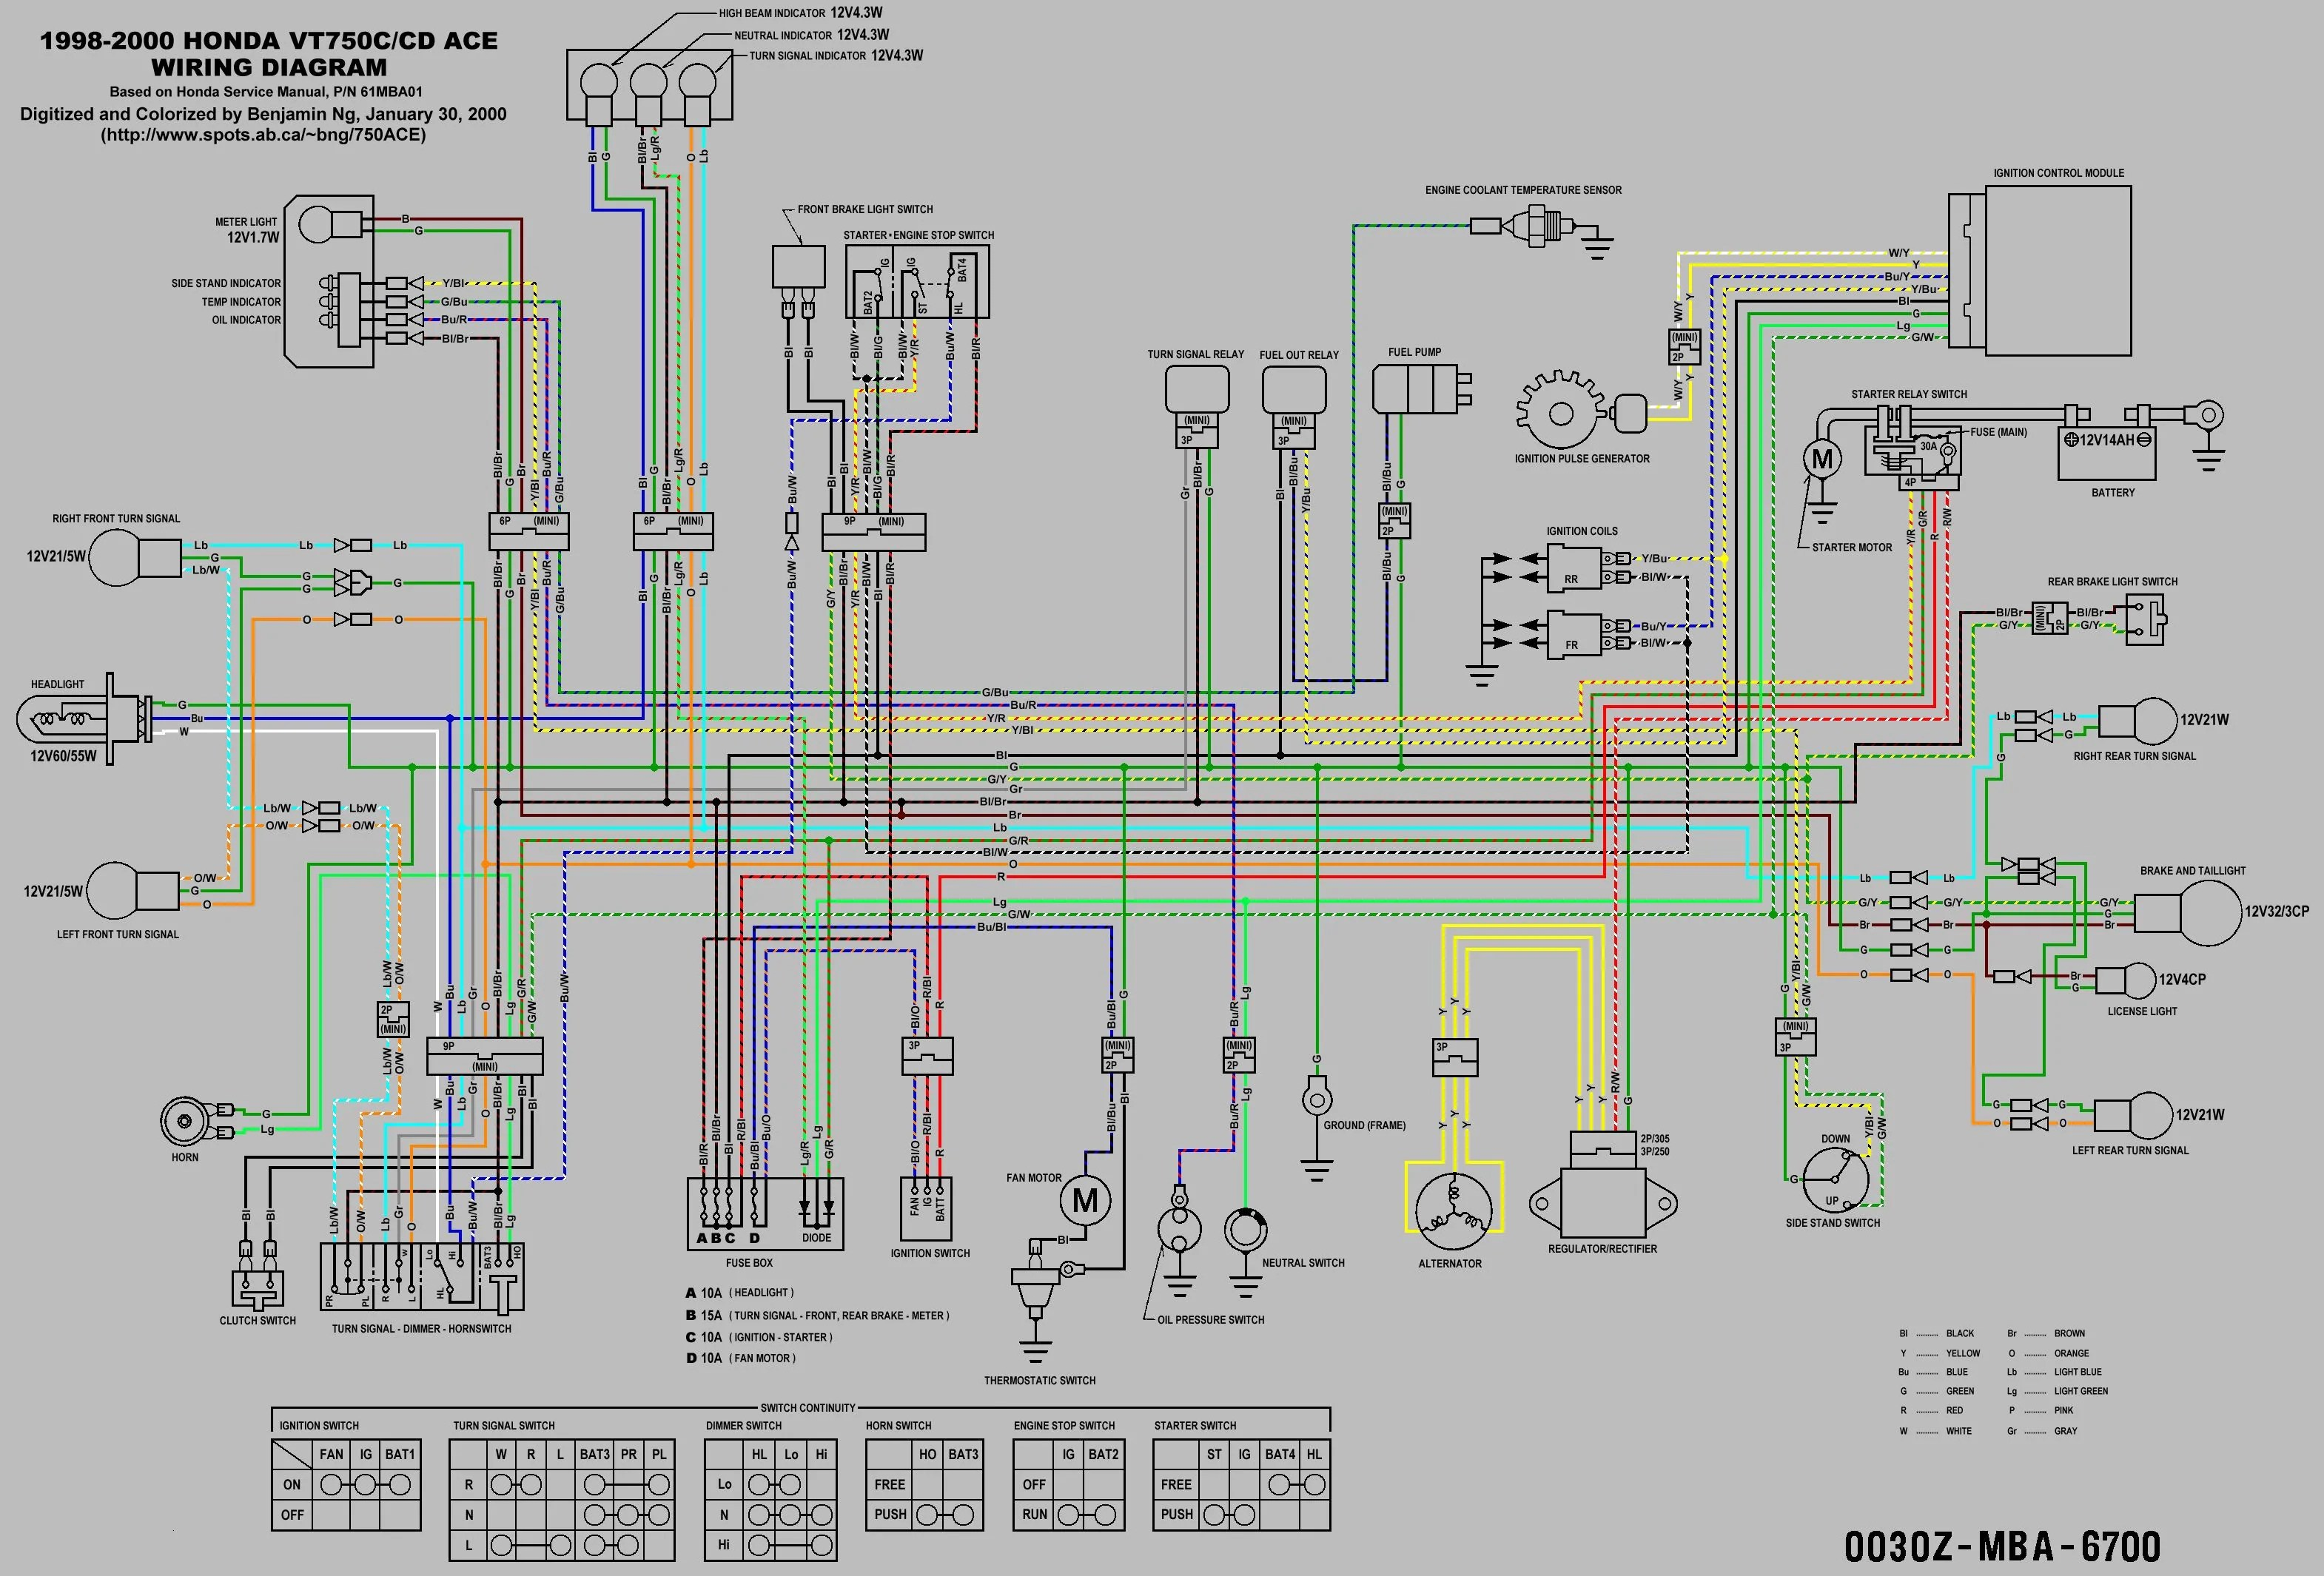 VT750_ACE_Wiring_Diagram_1998_ _2000?17490154244262524096 diagram 03 yamaha r6 wiring diagram 03 file rl90065